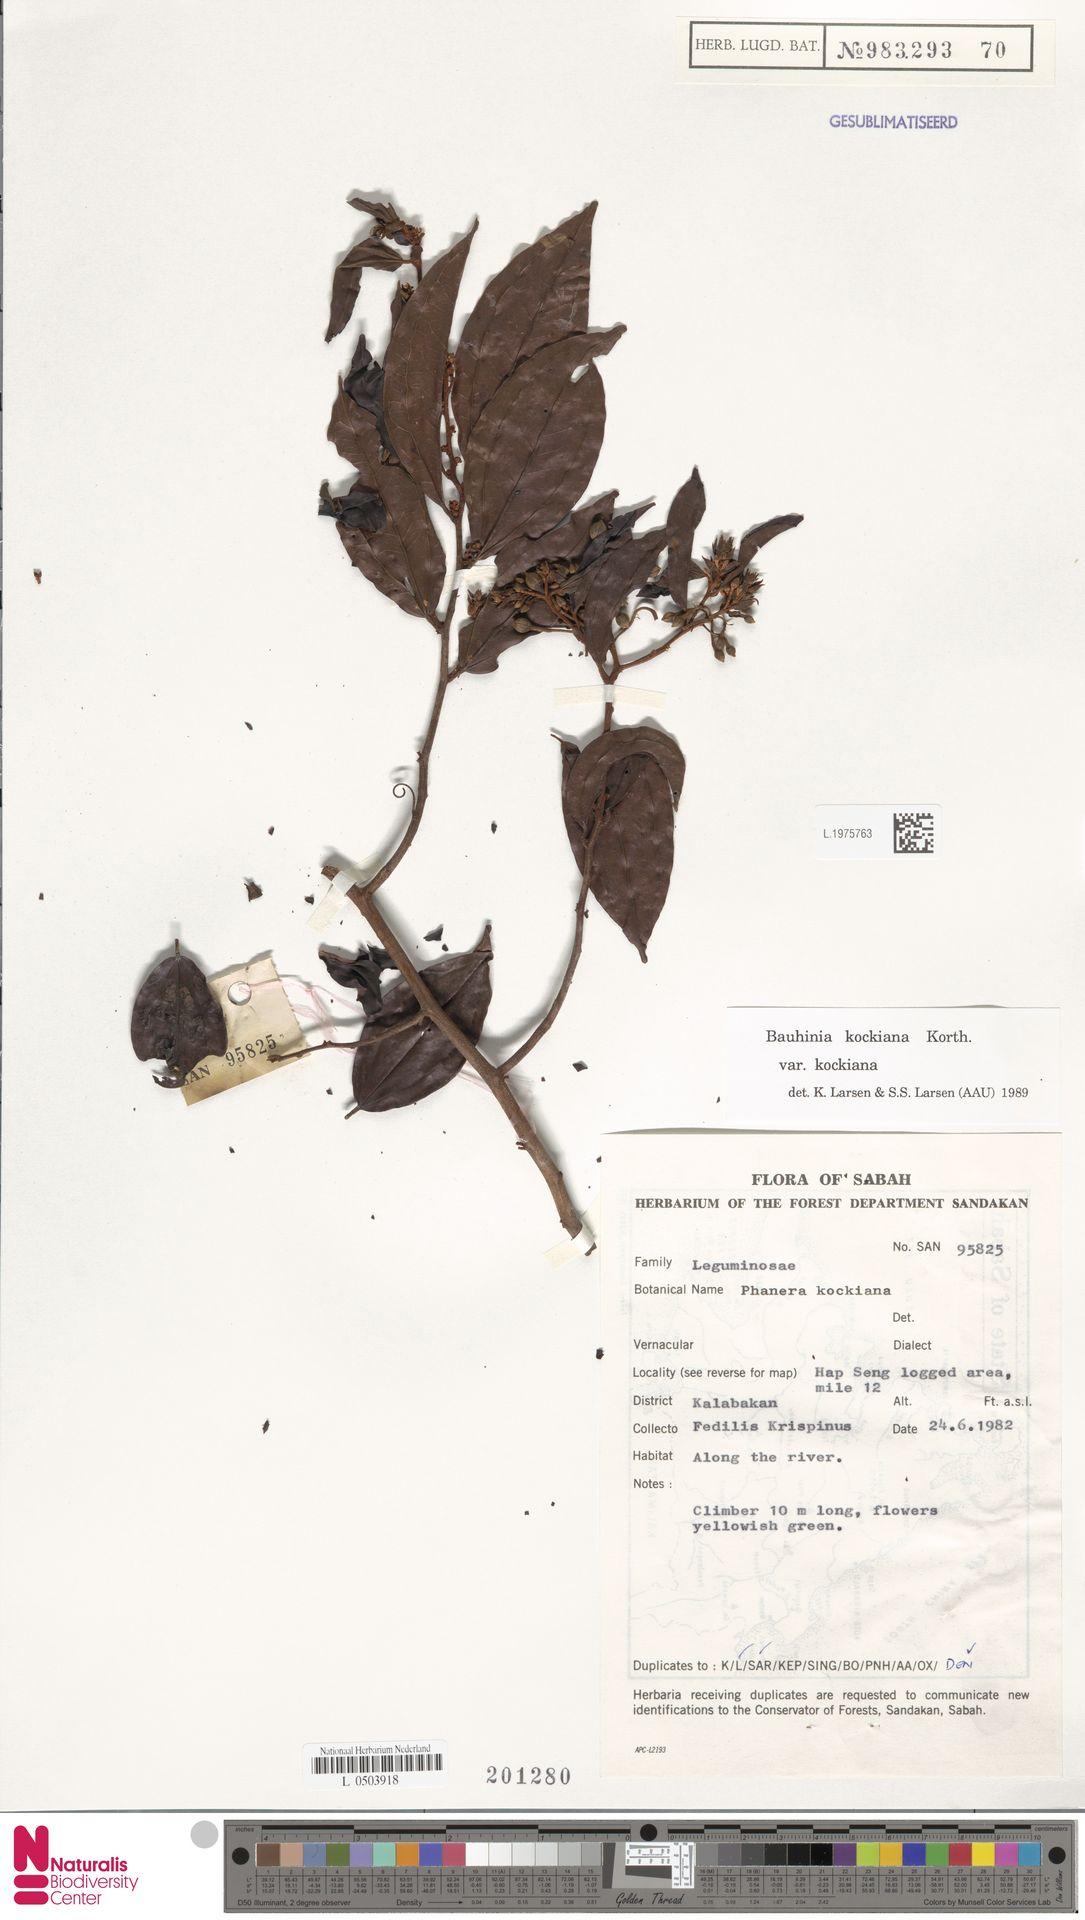 L.1975763 | Bauhinia kockiana var. kockiana